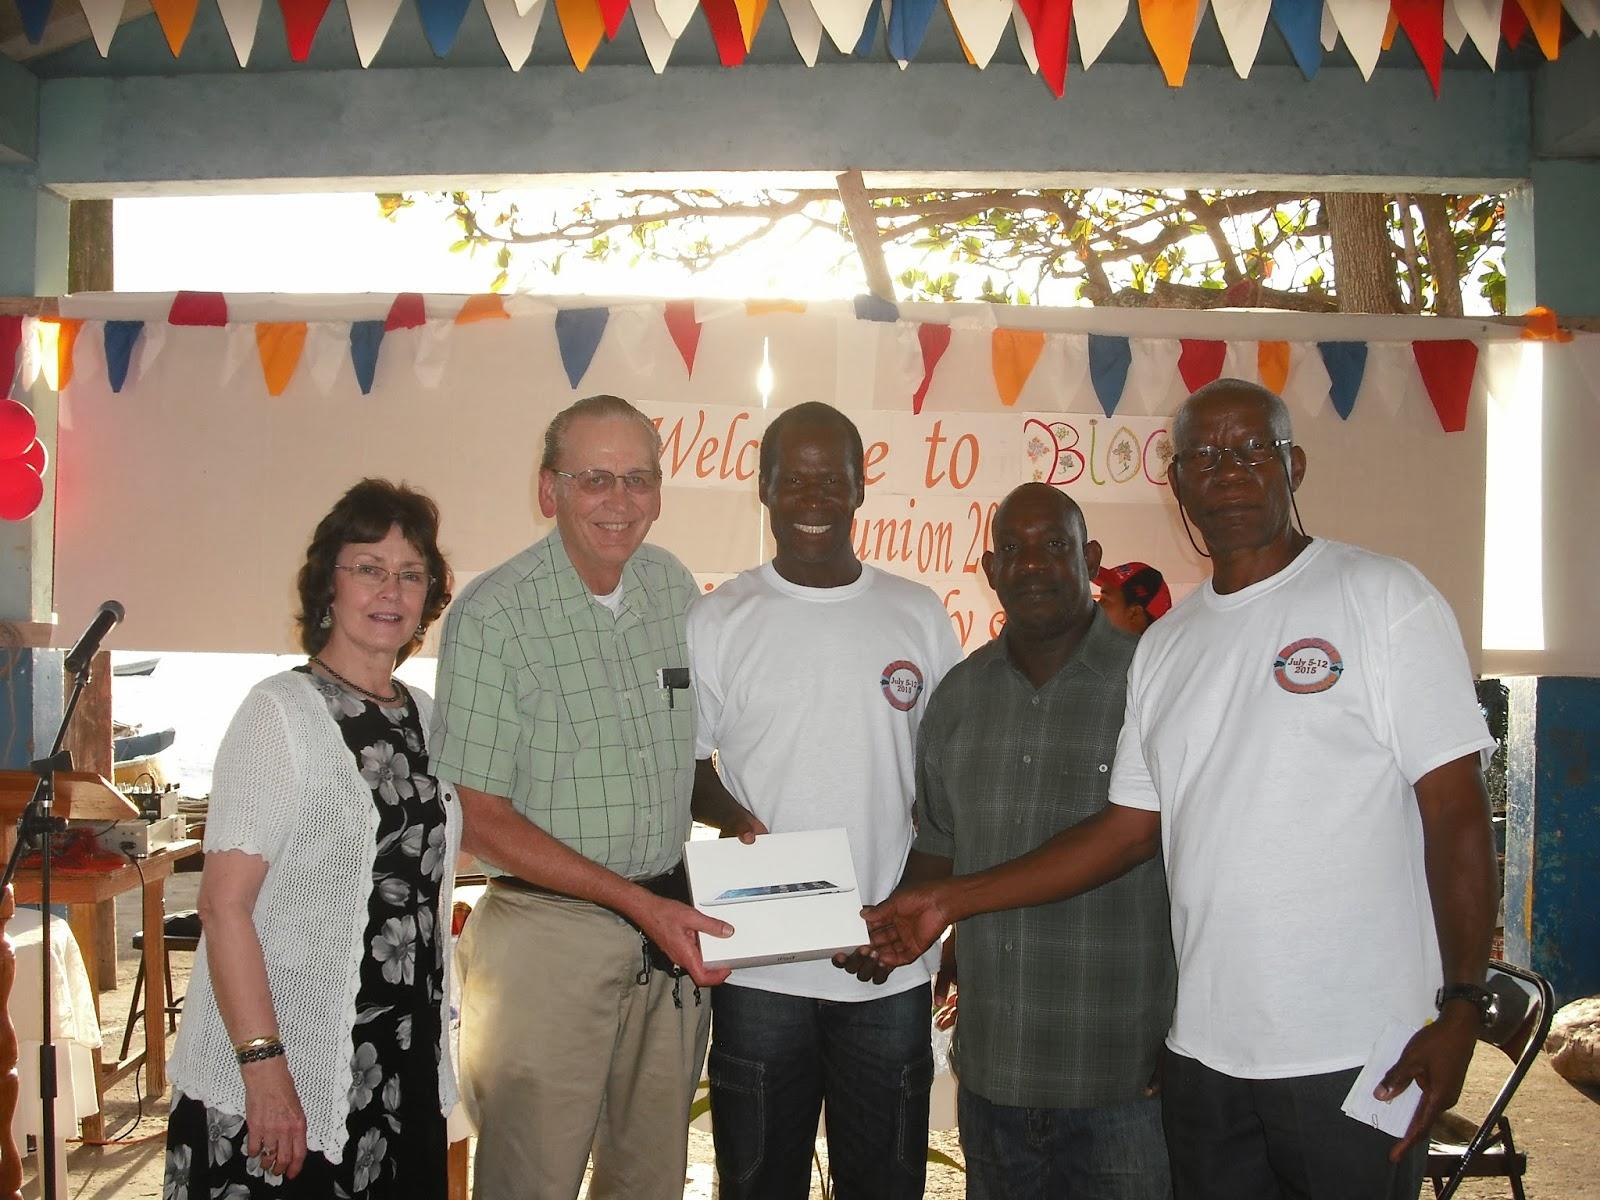 Bioche committee members Dominica